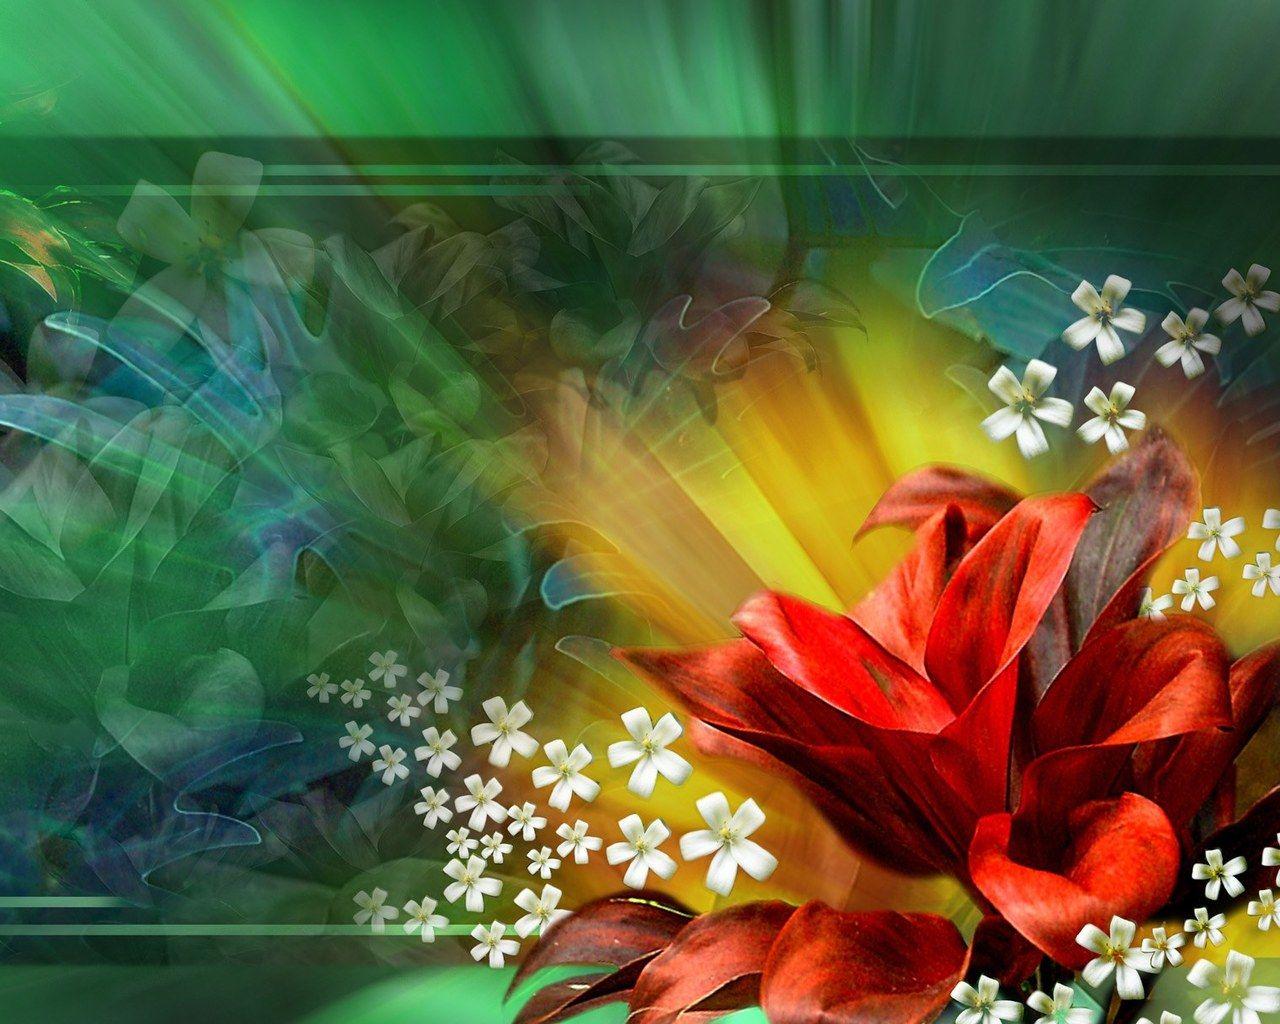 Computer Screensavers Rose Desktop Wallpaper animated 1280x1024